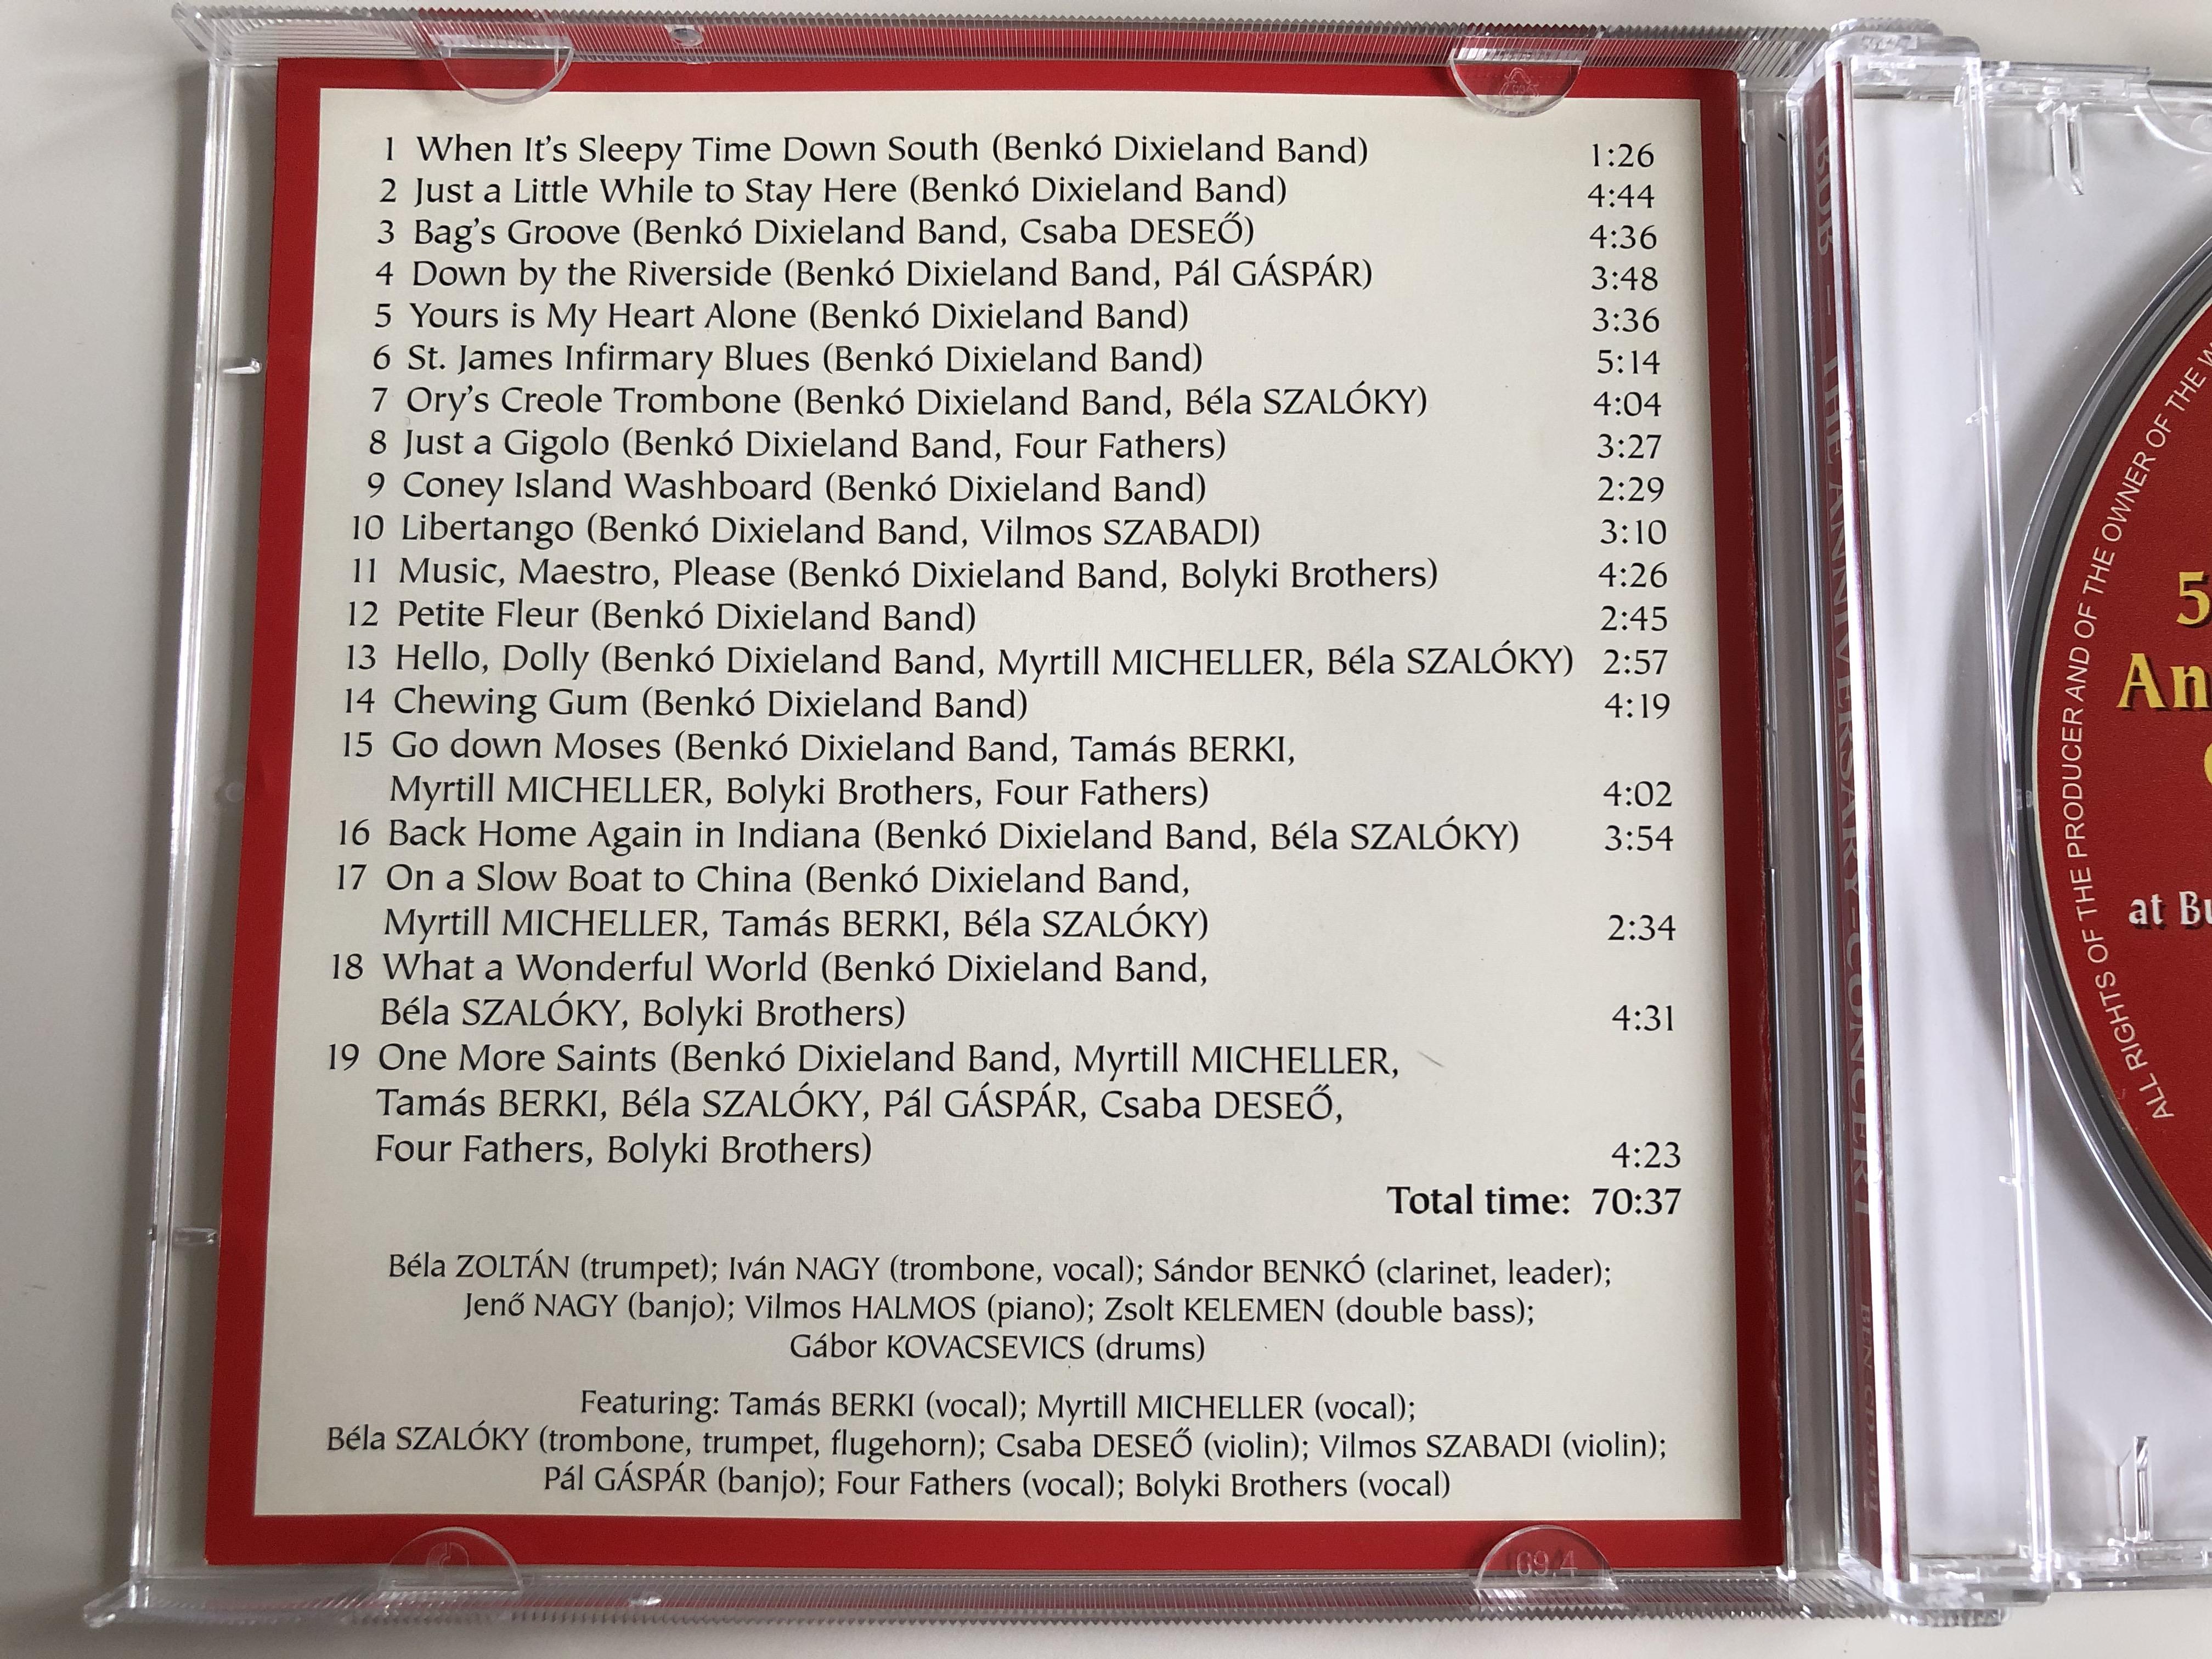 benk-dixieland-band-live-recorded-at-budapest-sportatrena-5nd-may-2007-the-anisversary-concert-bencolor-kft.-audio-cd-2007-stereo-ben-cd-5451-4-.jpg